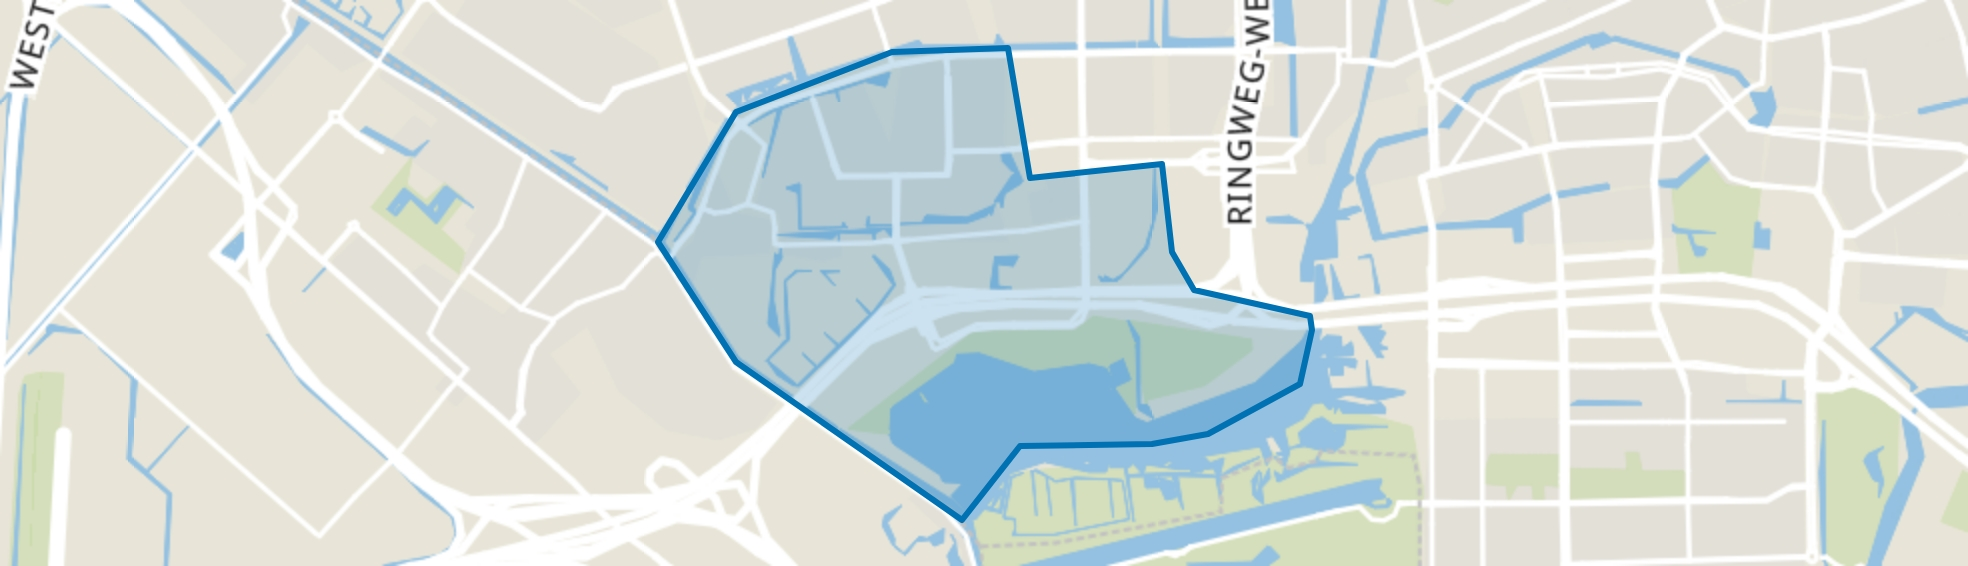 Sloter-/Riekerpolder, Amsterdam map